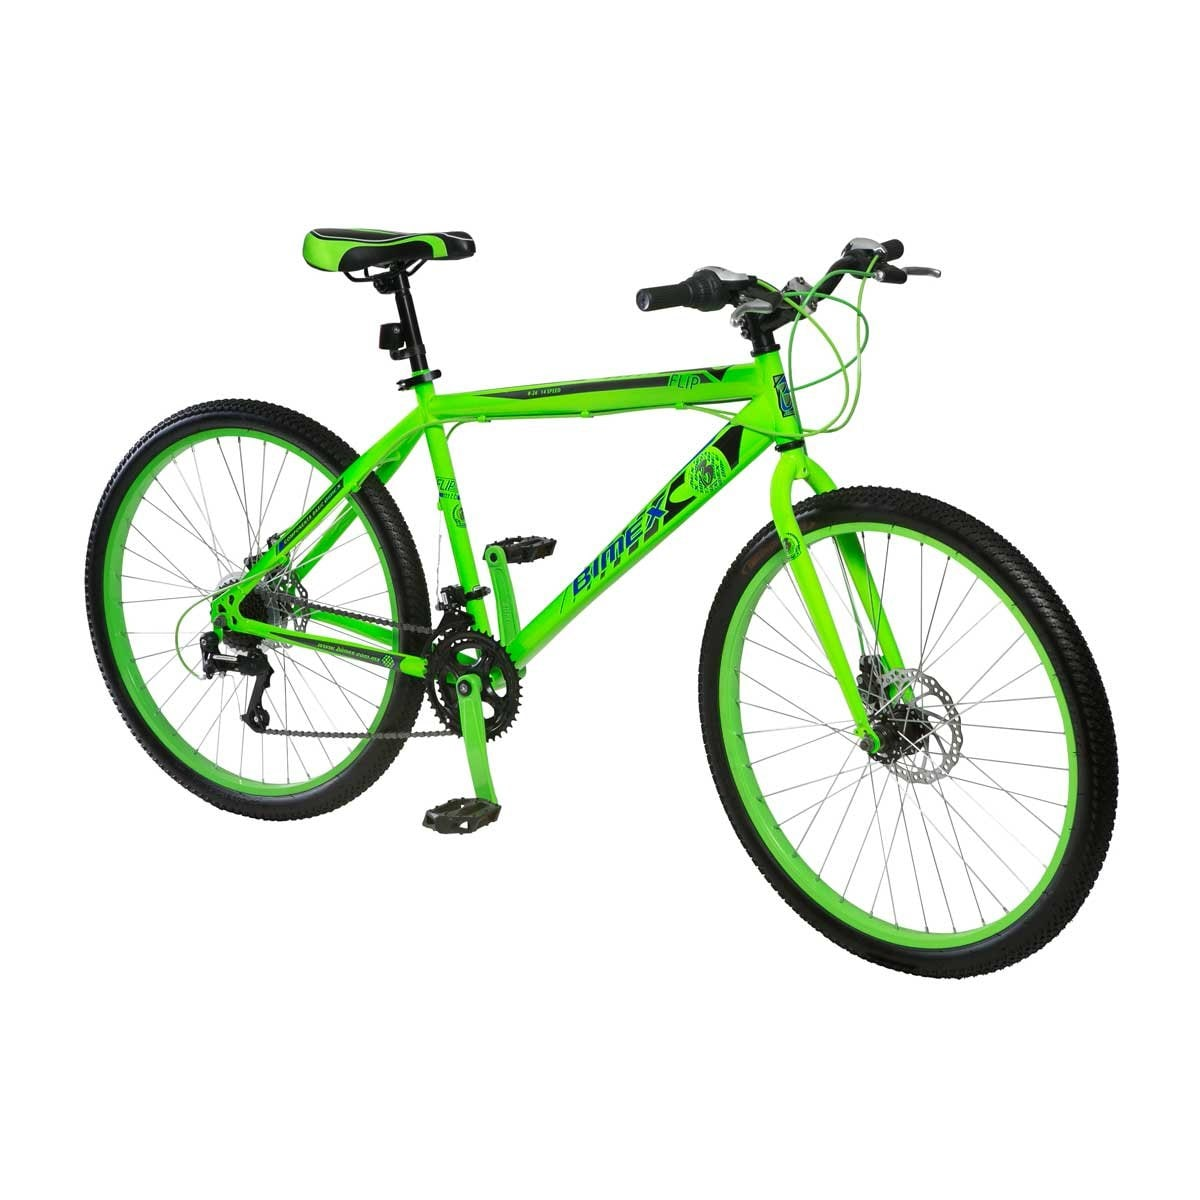 Bicicleta Rodada 26 Flip 2019 Verde Bimex